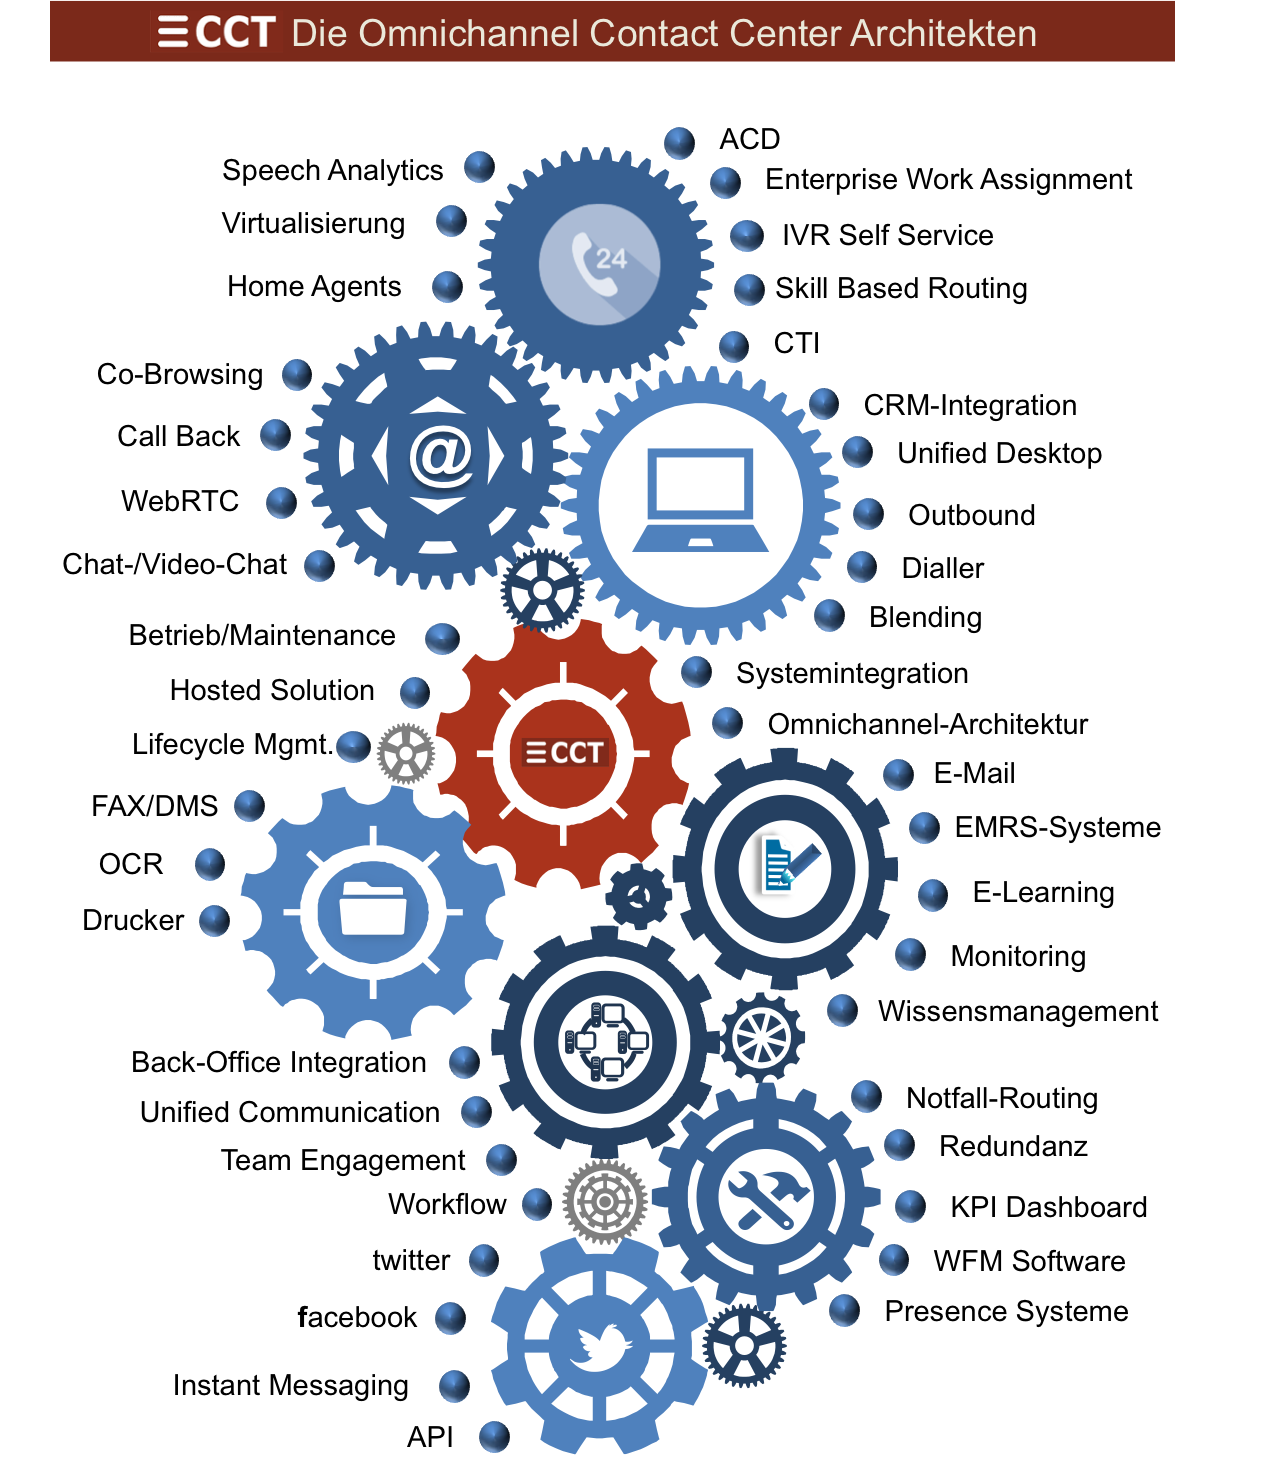 Instant Message Service Center : Omnichannel contact center komplexität pur marketing